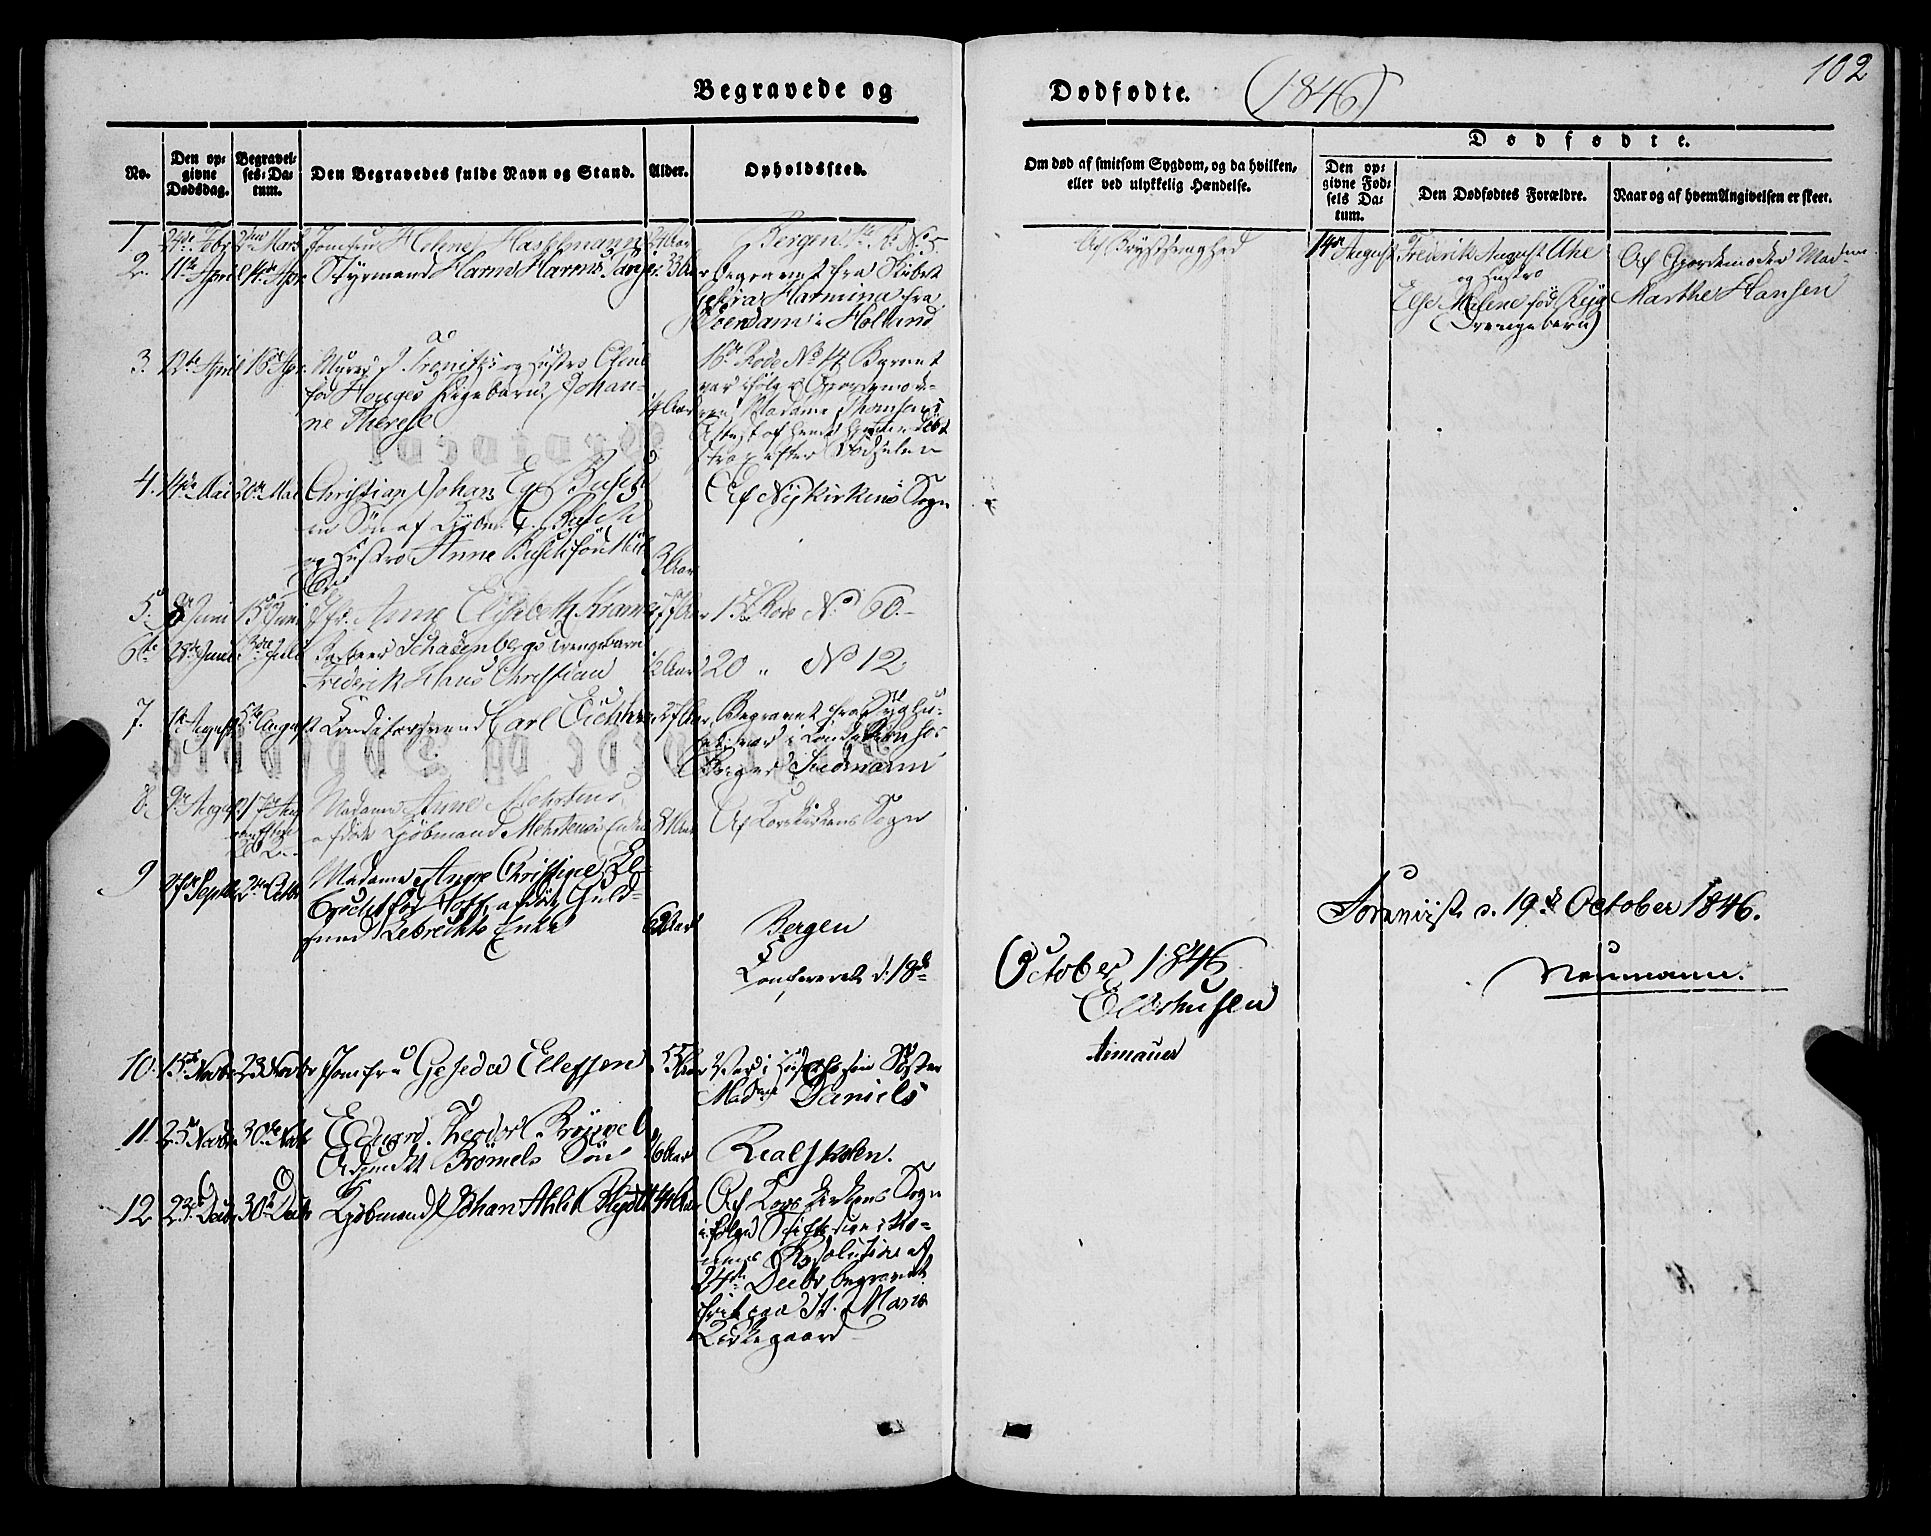 SAB, Mariakirken Sokneprestembete, H/Haa/L0006: Ministerialbok nr. A 6, 1846-1877, s. 102